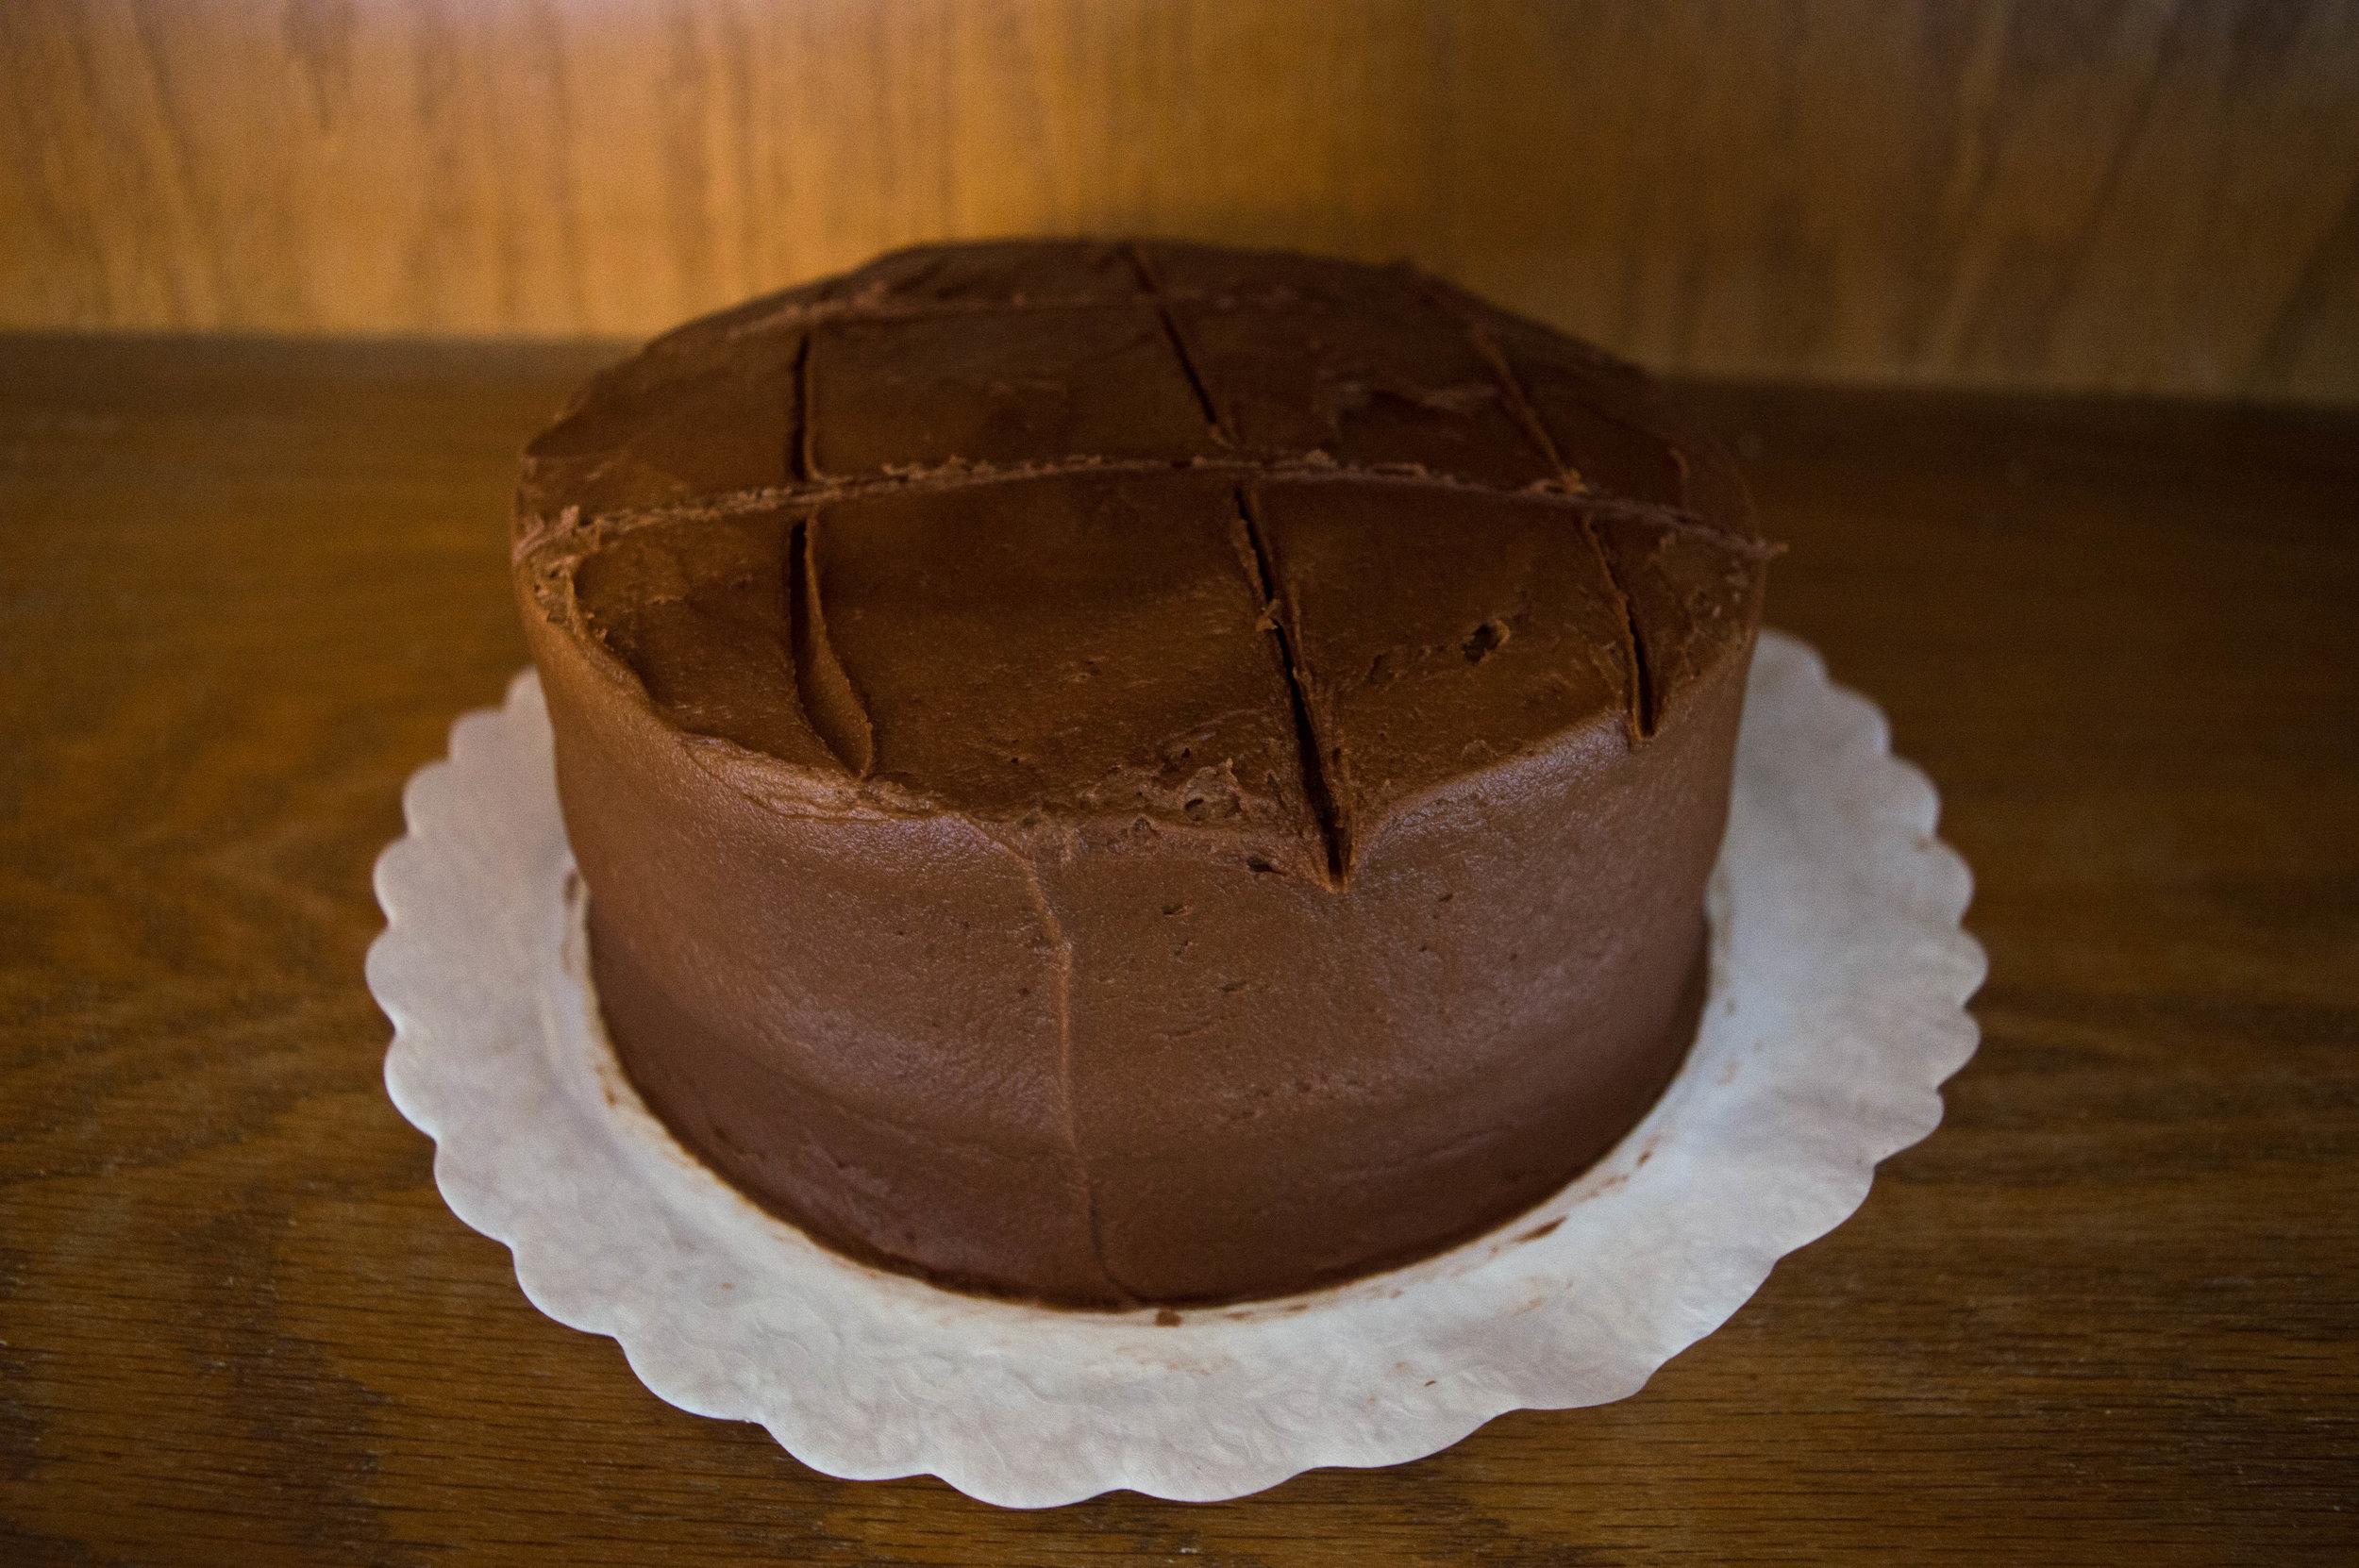 Chocolate Iced Cake